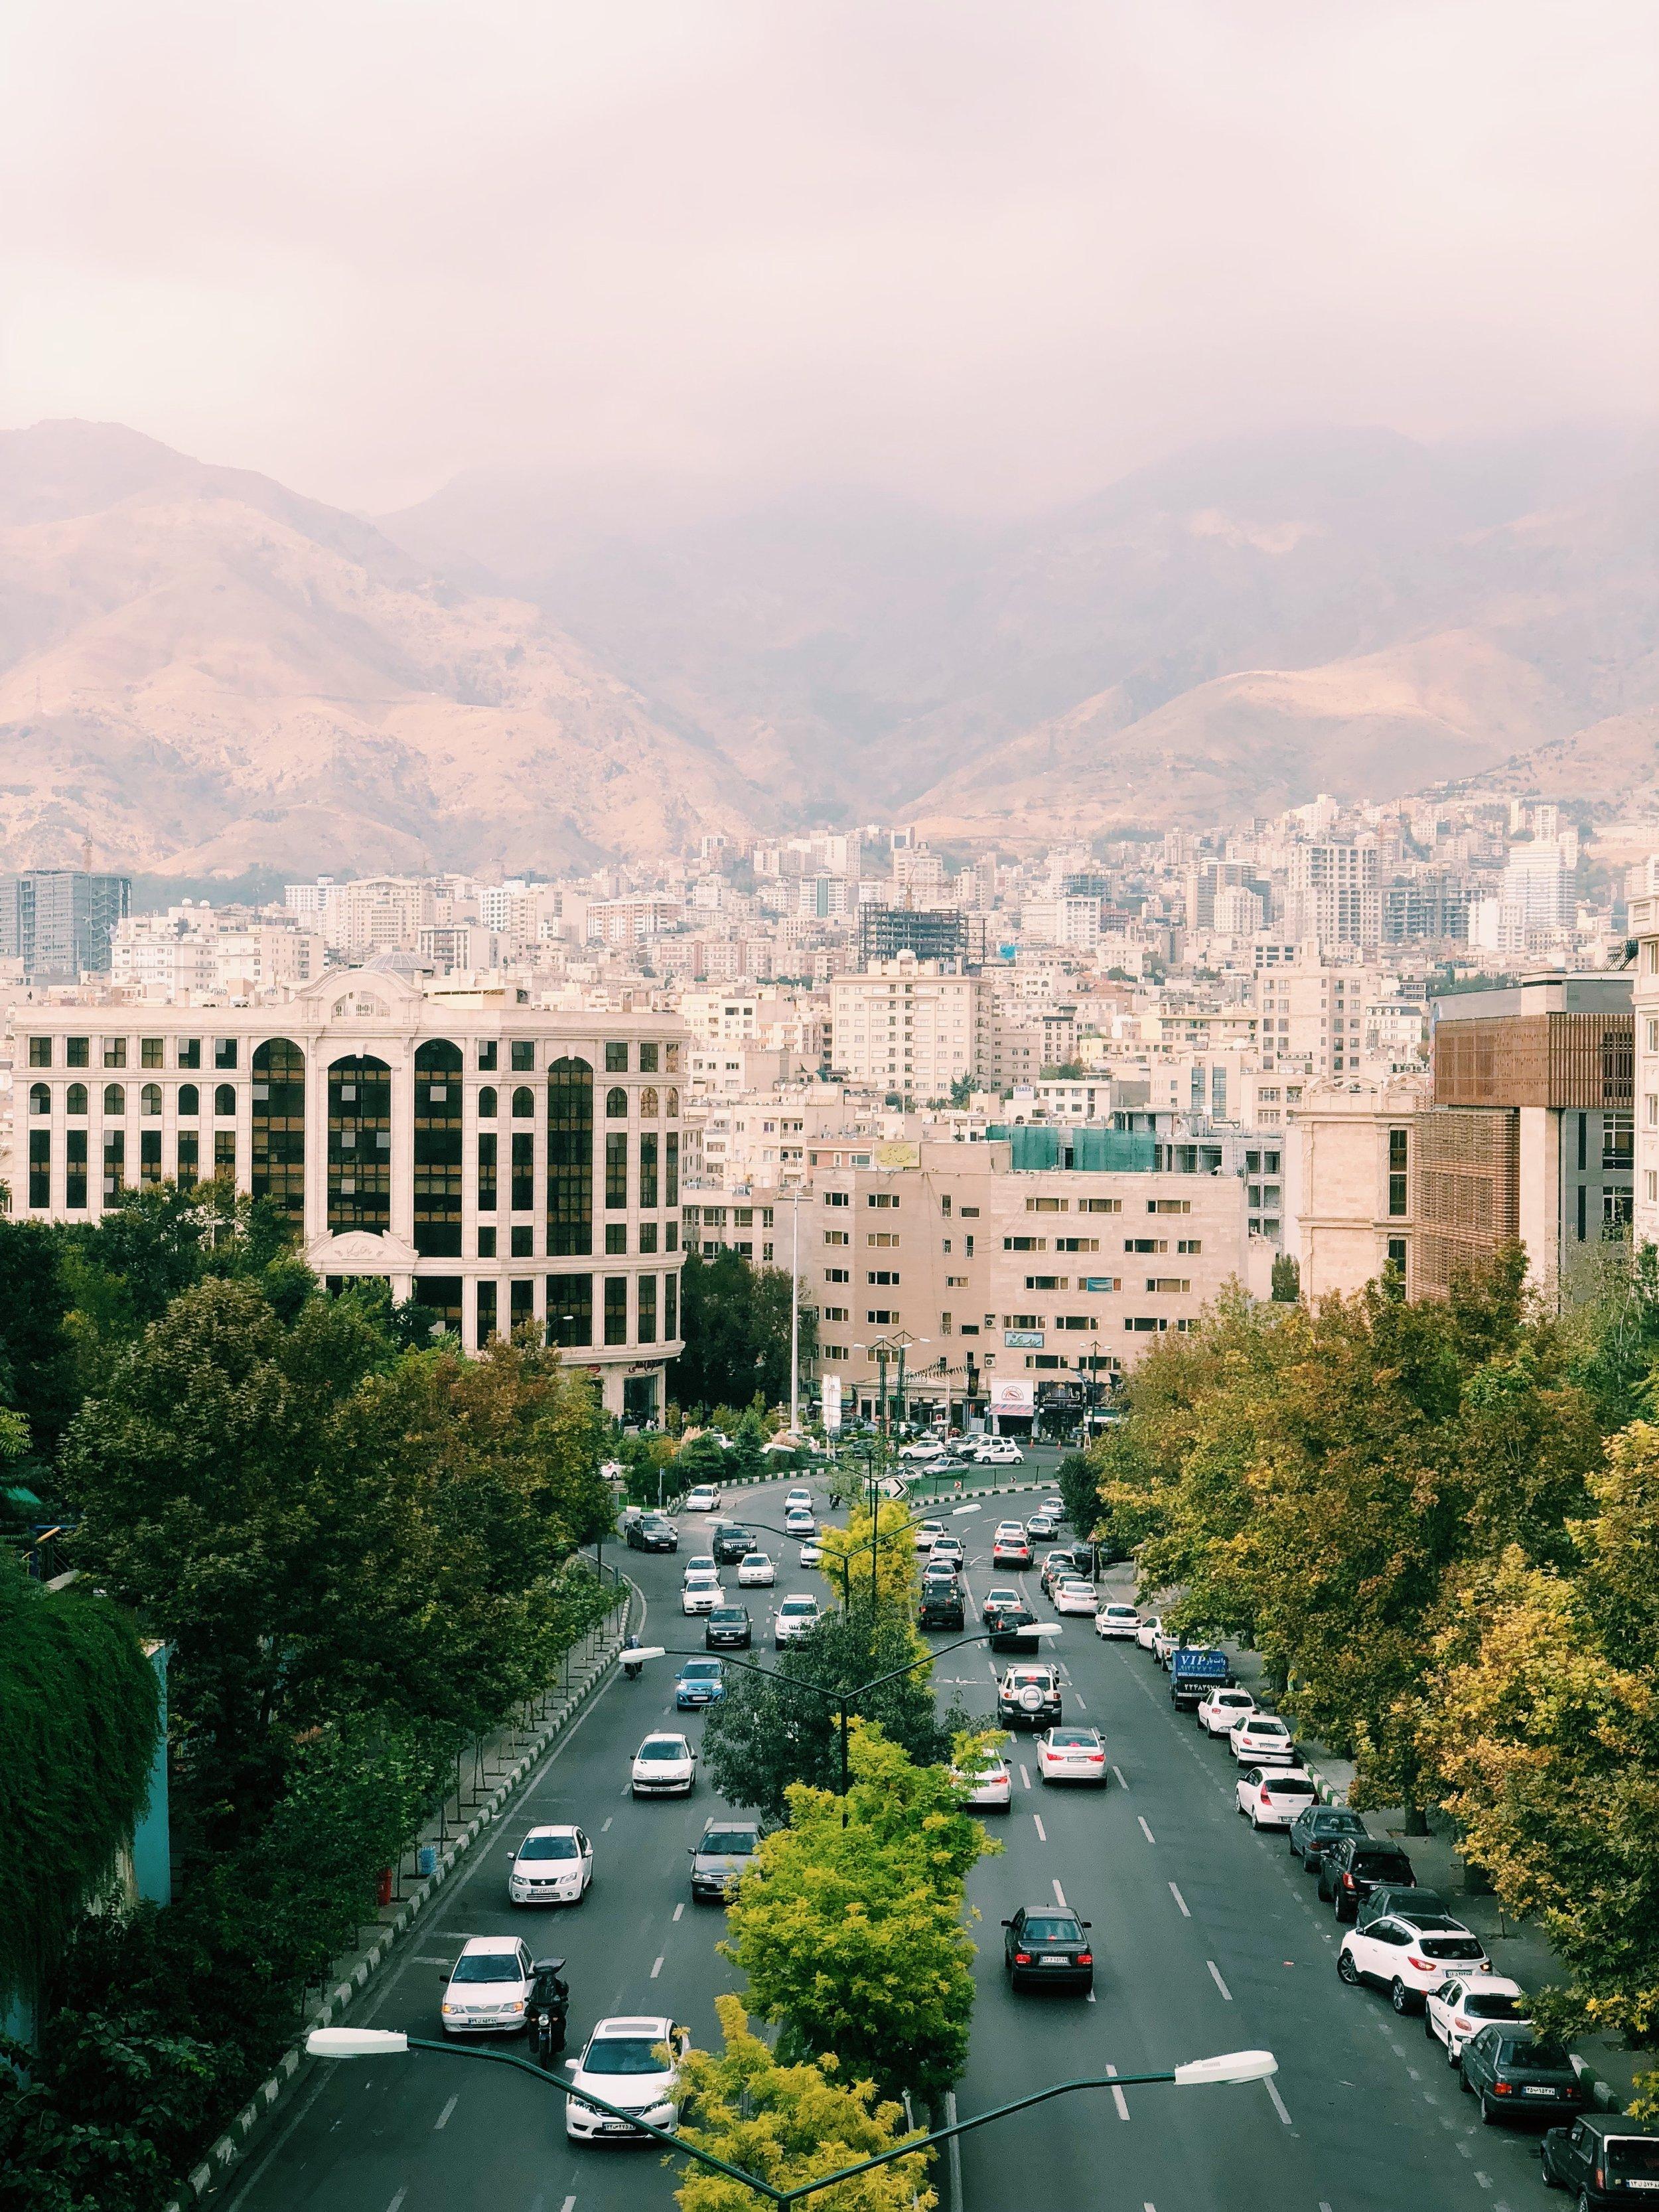 atelier-the-che-our-history-tehran-iran